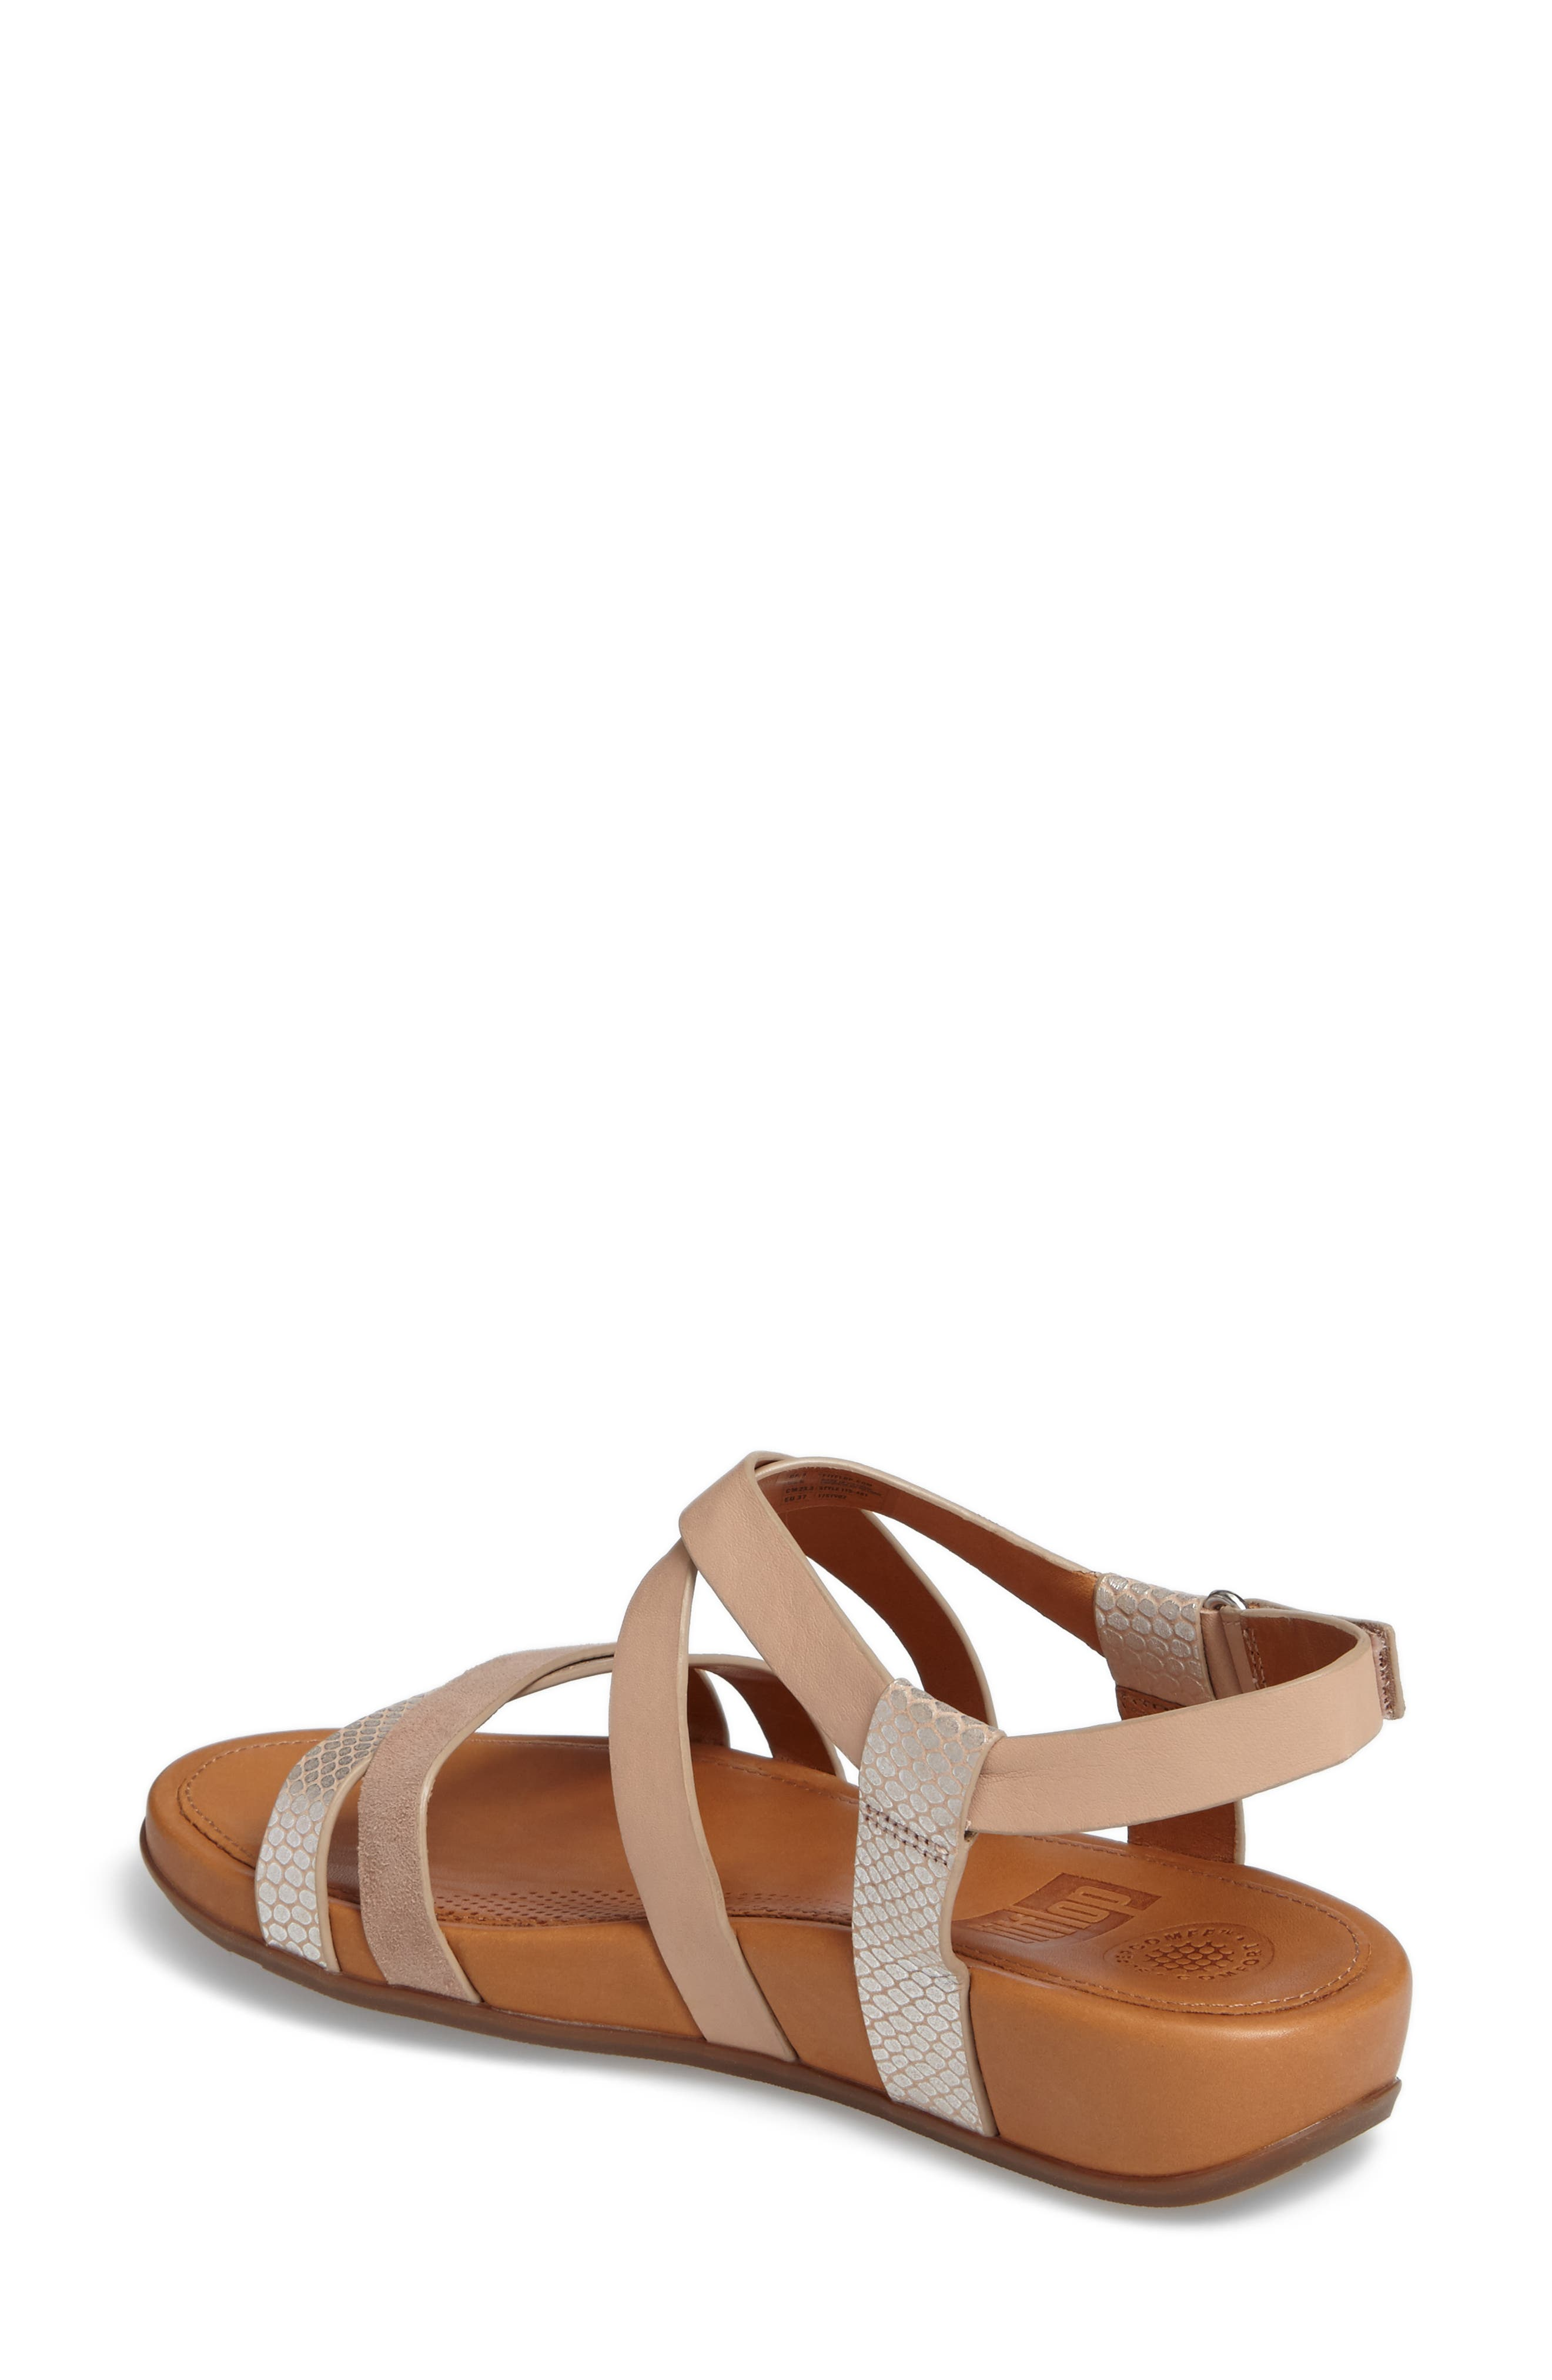 Alternate Image 2  - FitFlop Lumy Crisscross Sandal (Women)